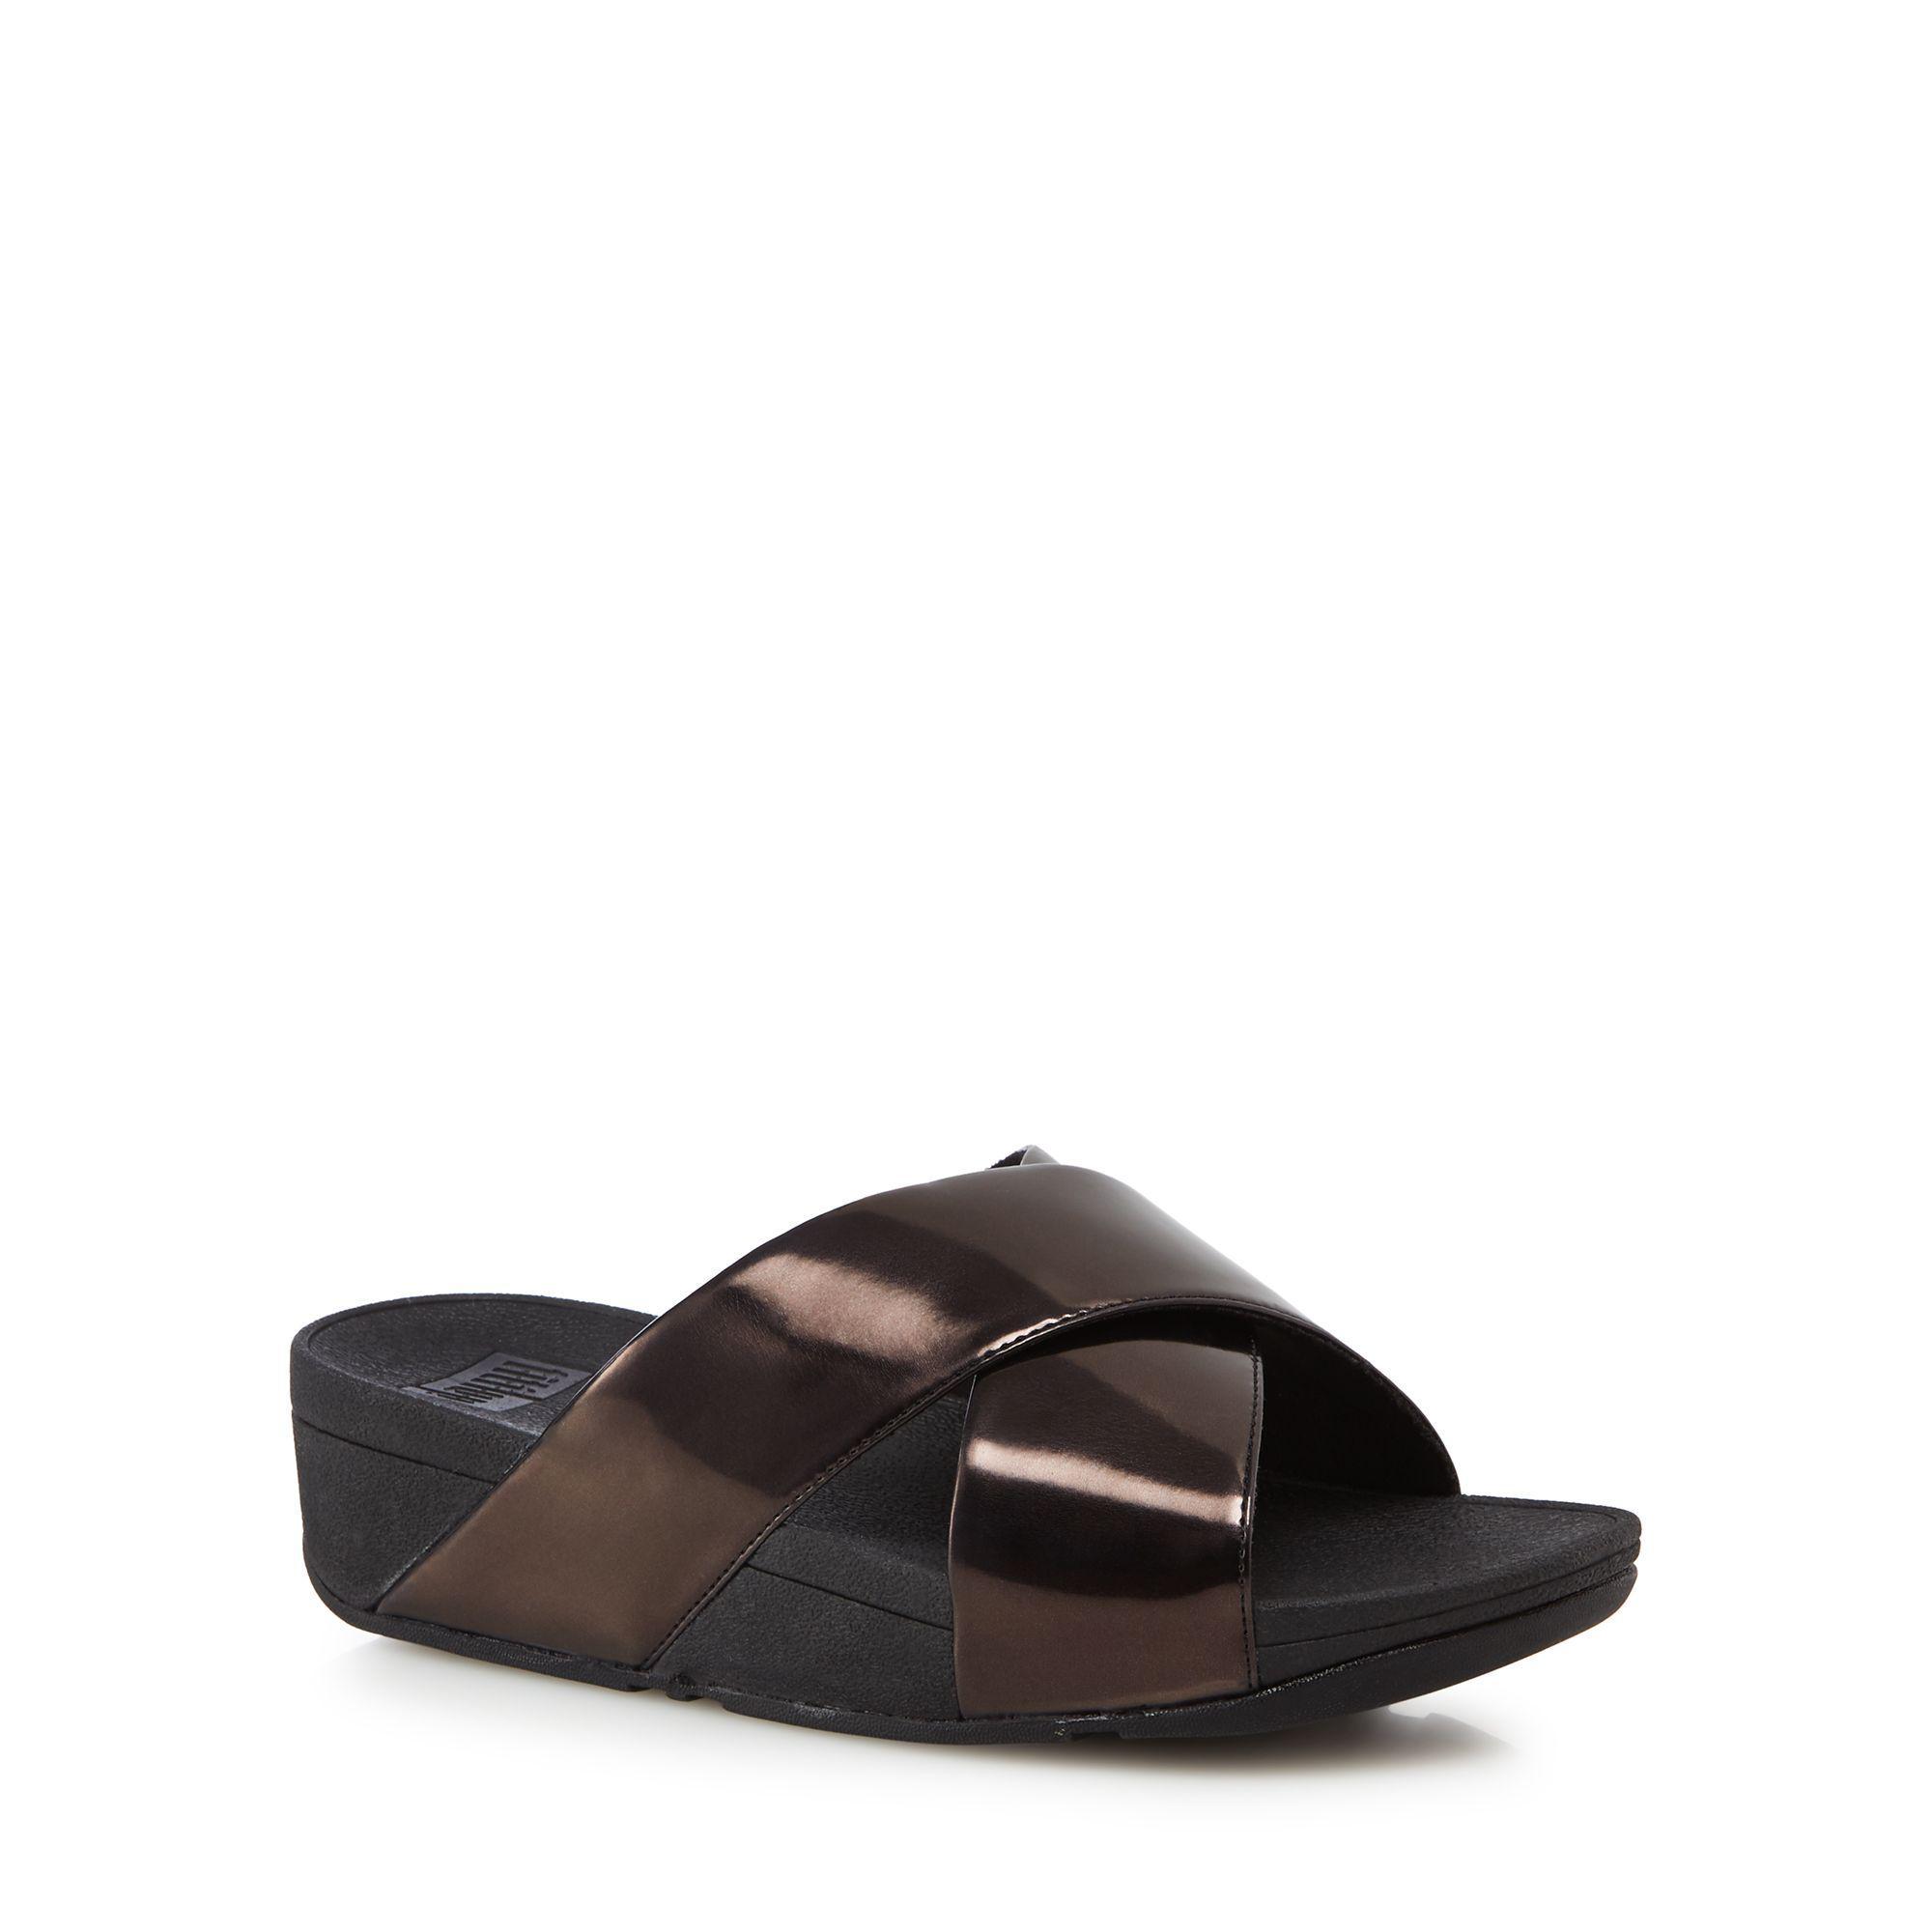 Black patent 'Lulu ' wedge heel cross slide sandals good selling 8ESYsFxD9o